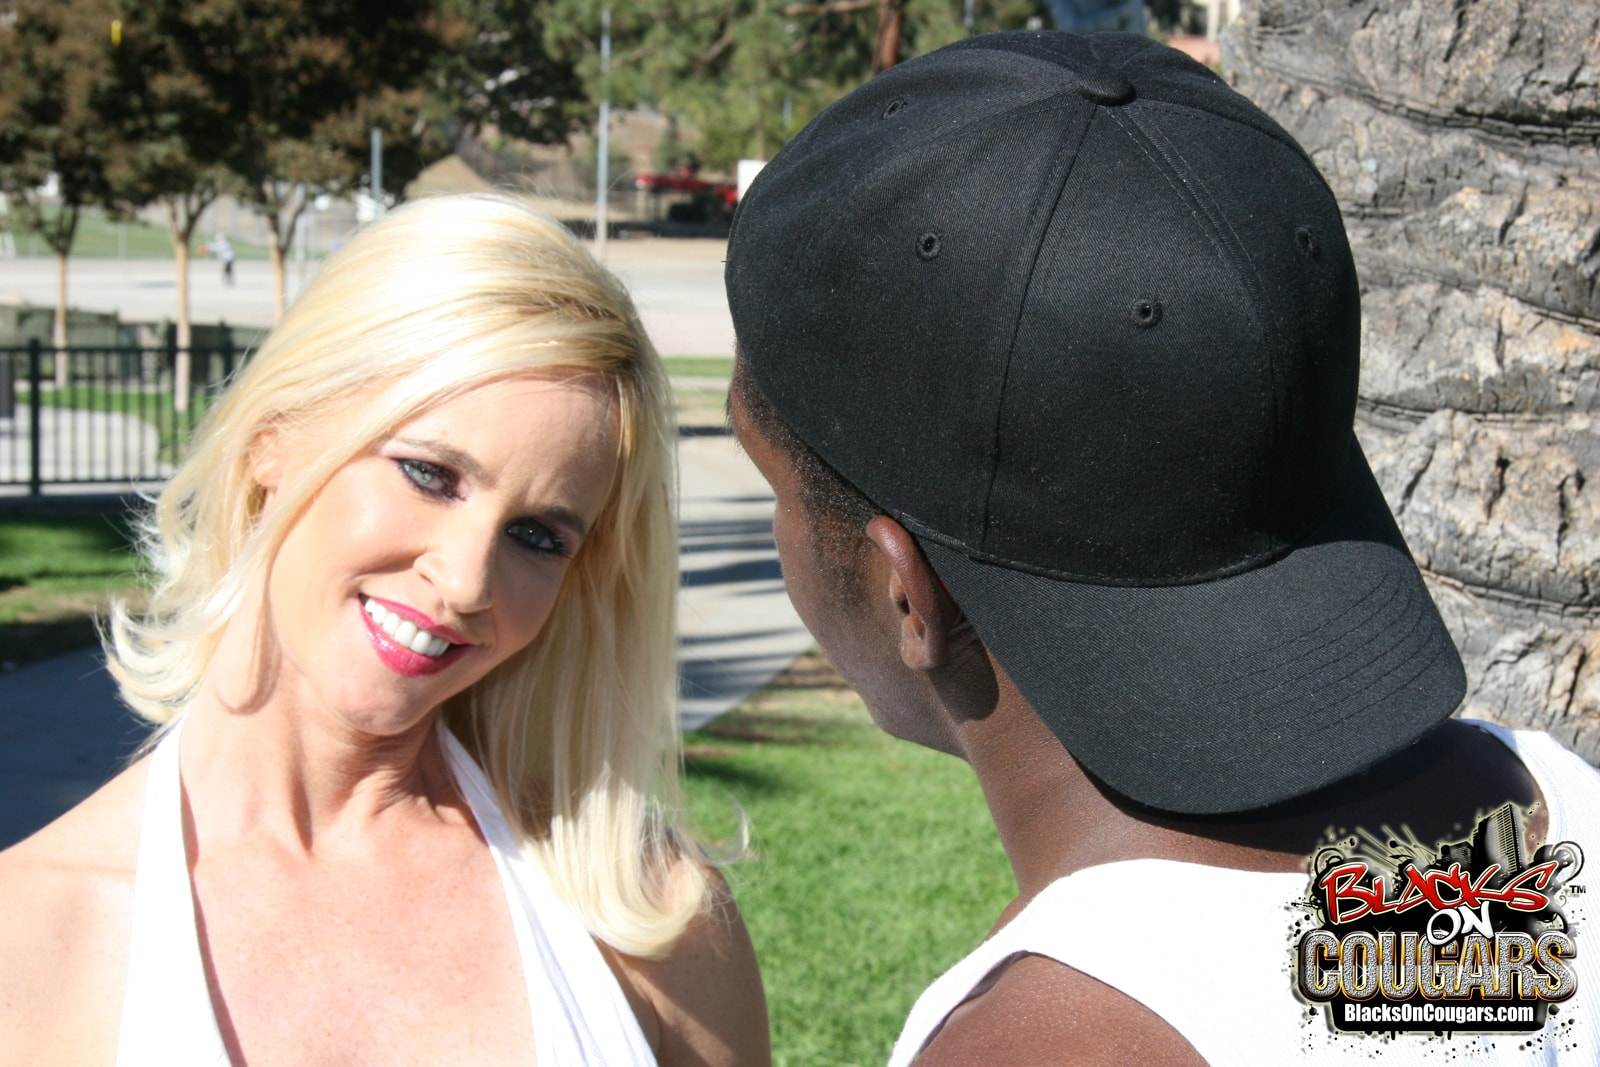 Dogfart '- Blacks On Cougars' starring Tabitha (Photo 3)